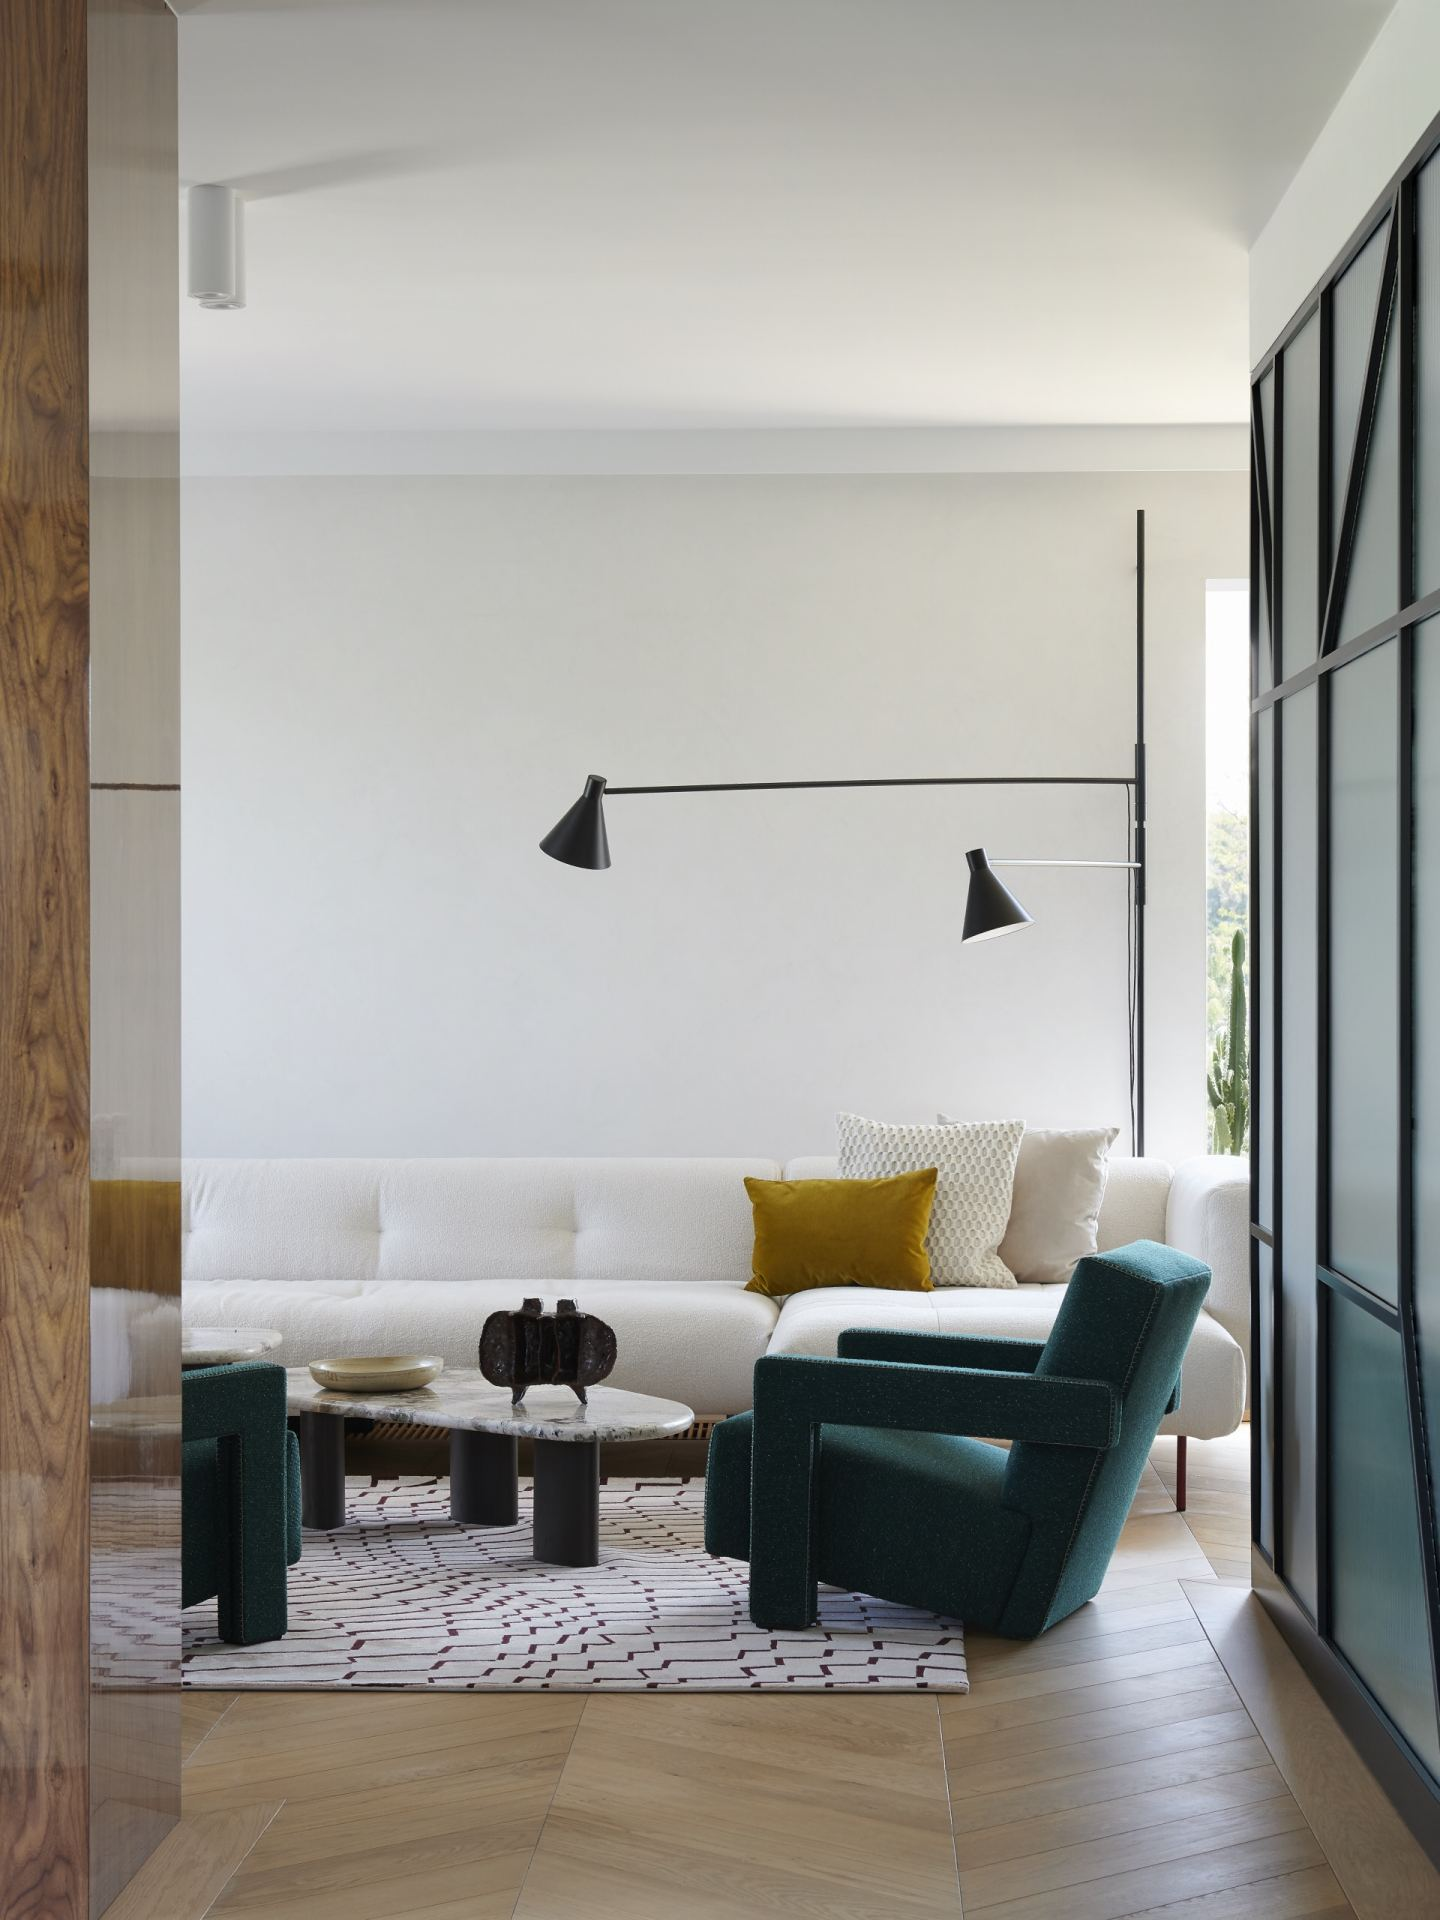 FCH-Apartment_paradowski_studio_designalive-7